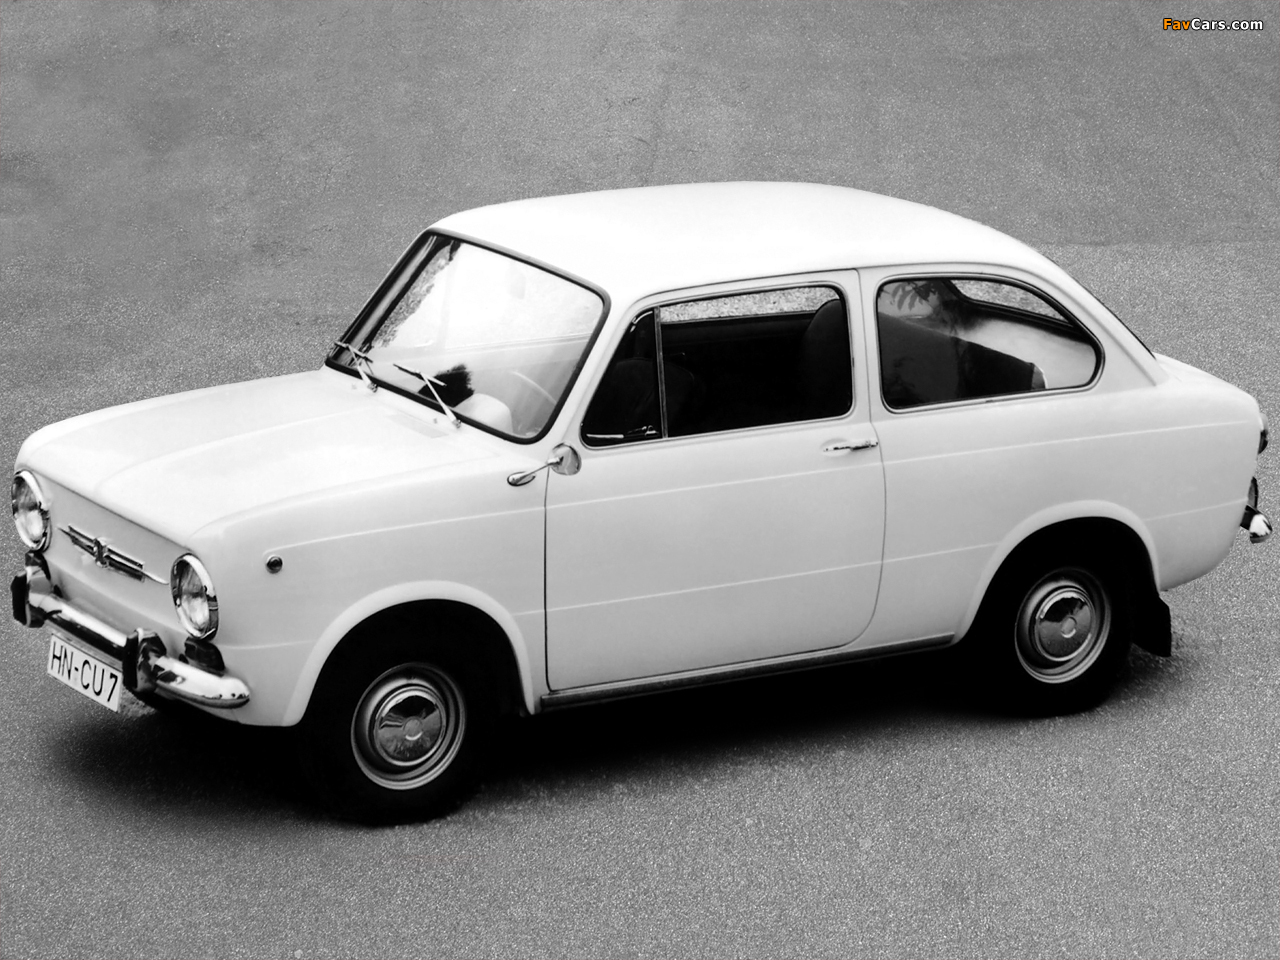 Photos Fiat 850 1964 68 54817 likewise Photo as well Fiat 124 Spider 3 as well 9714587067 besides Fiat Spider Europa 1500 Osca Spider. on fiat spider